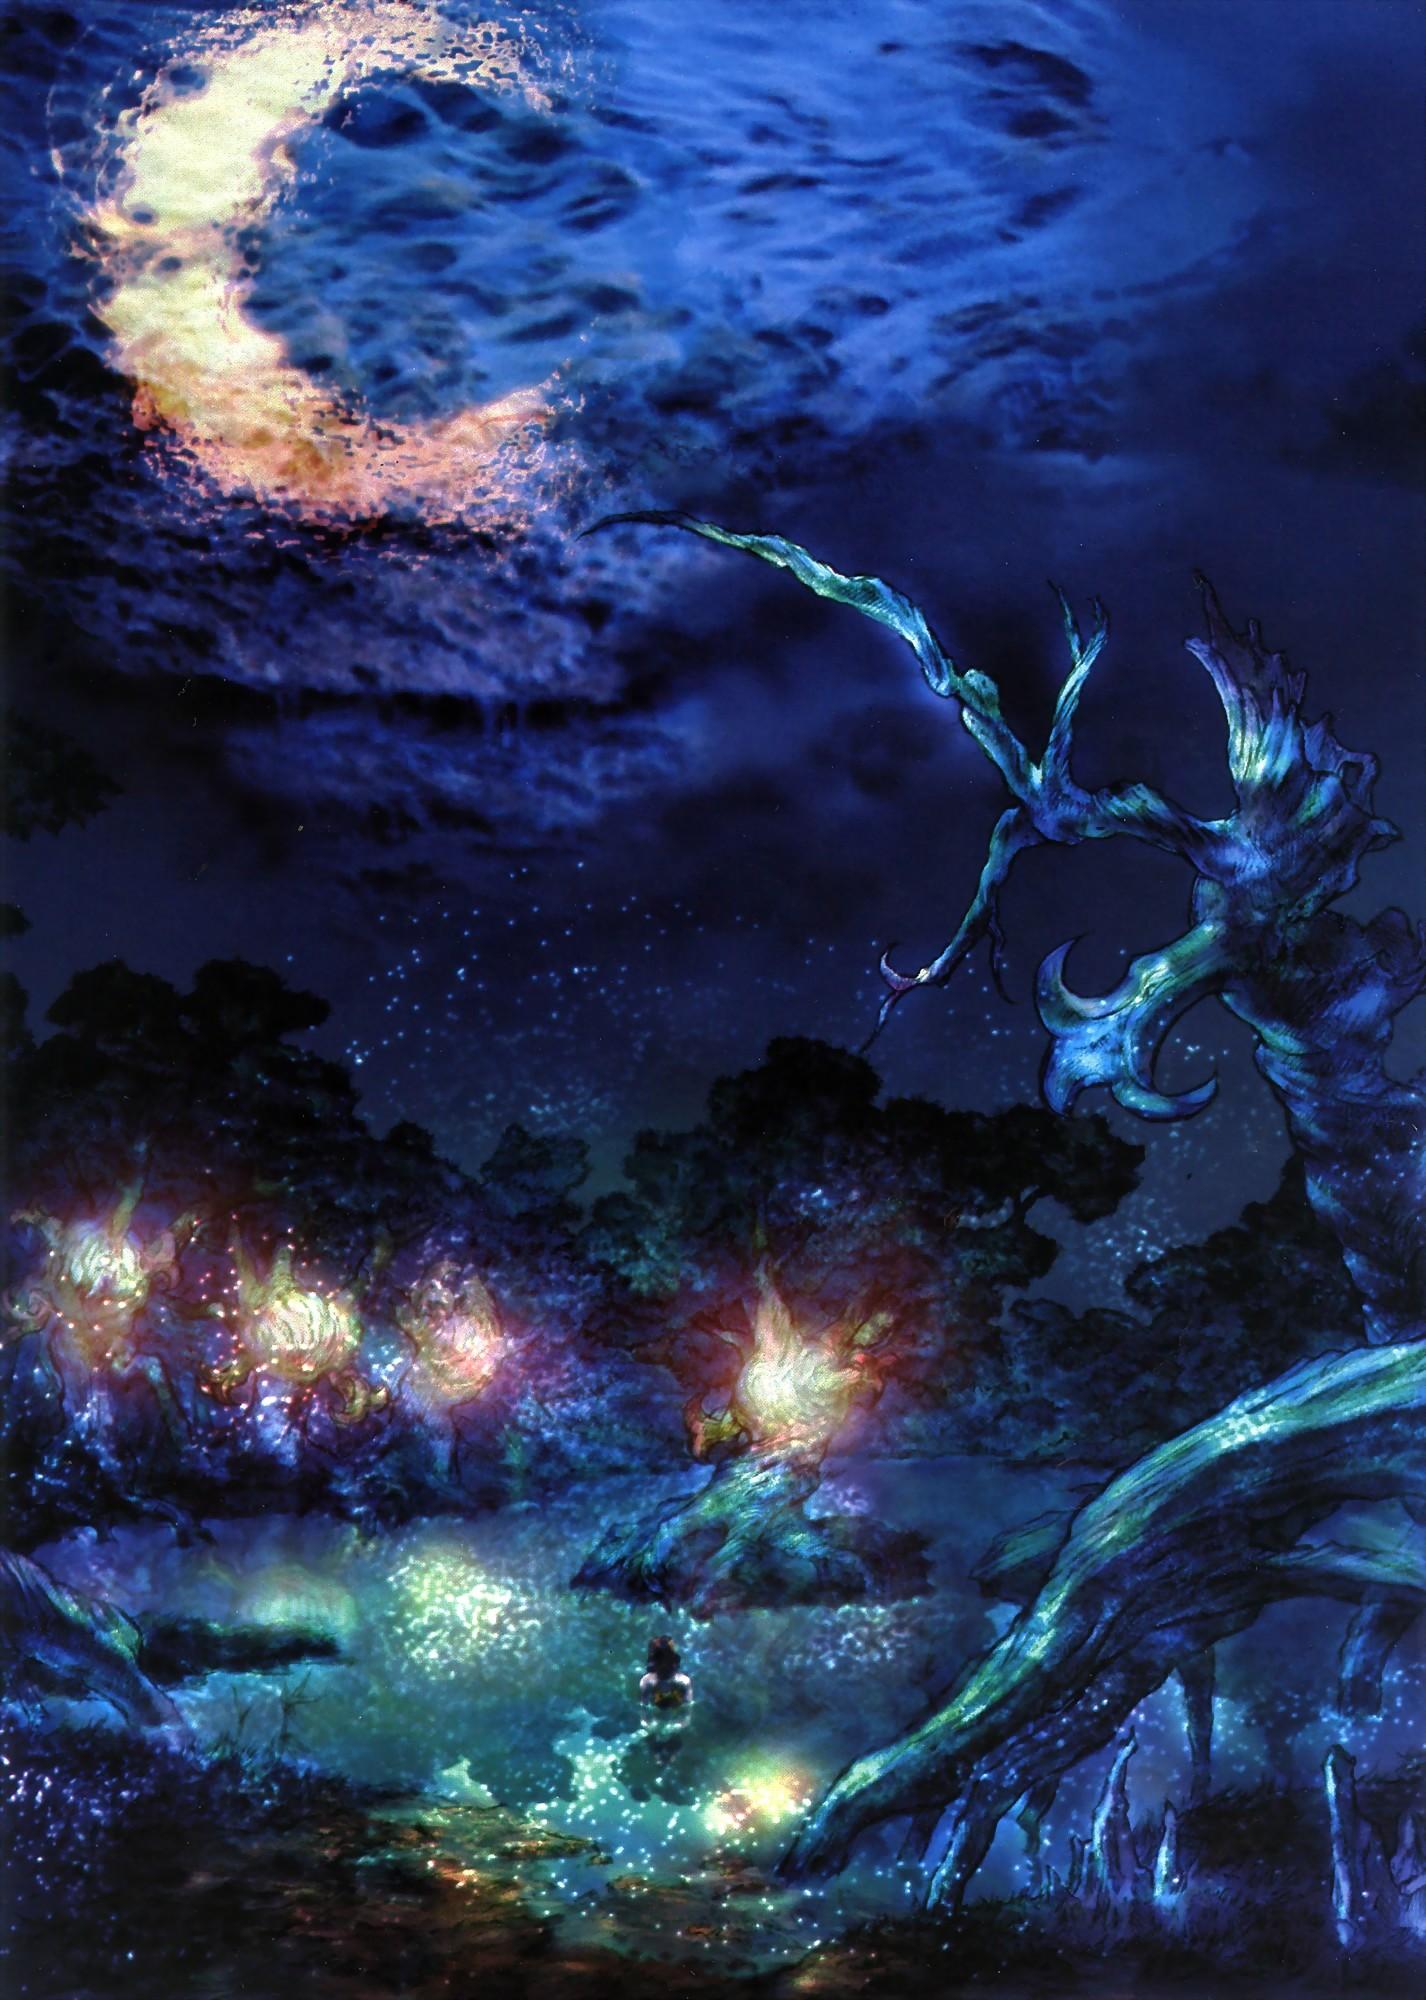 Final fantasy x wallpaper 71 images - Final fantasy phone wallpaper ...